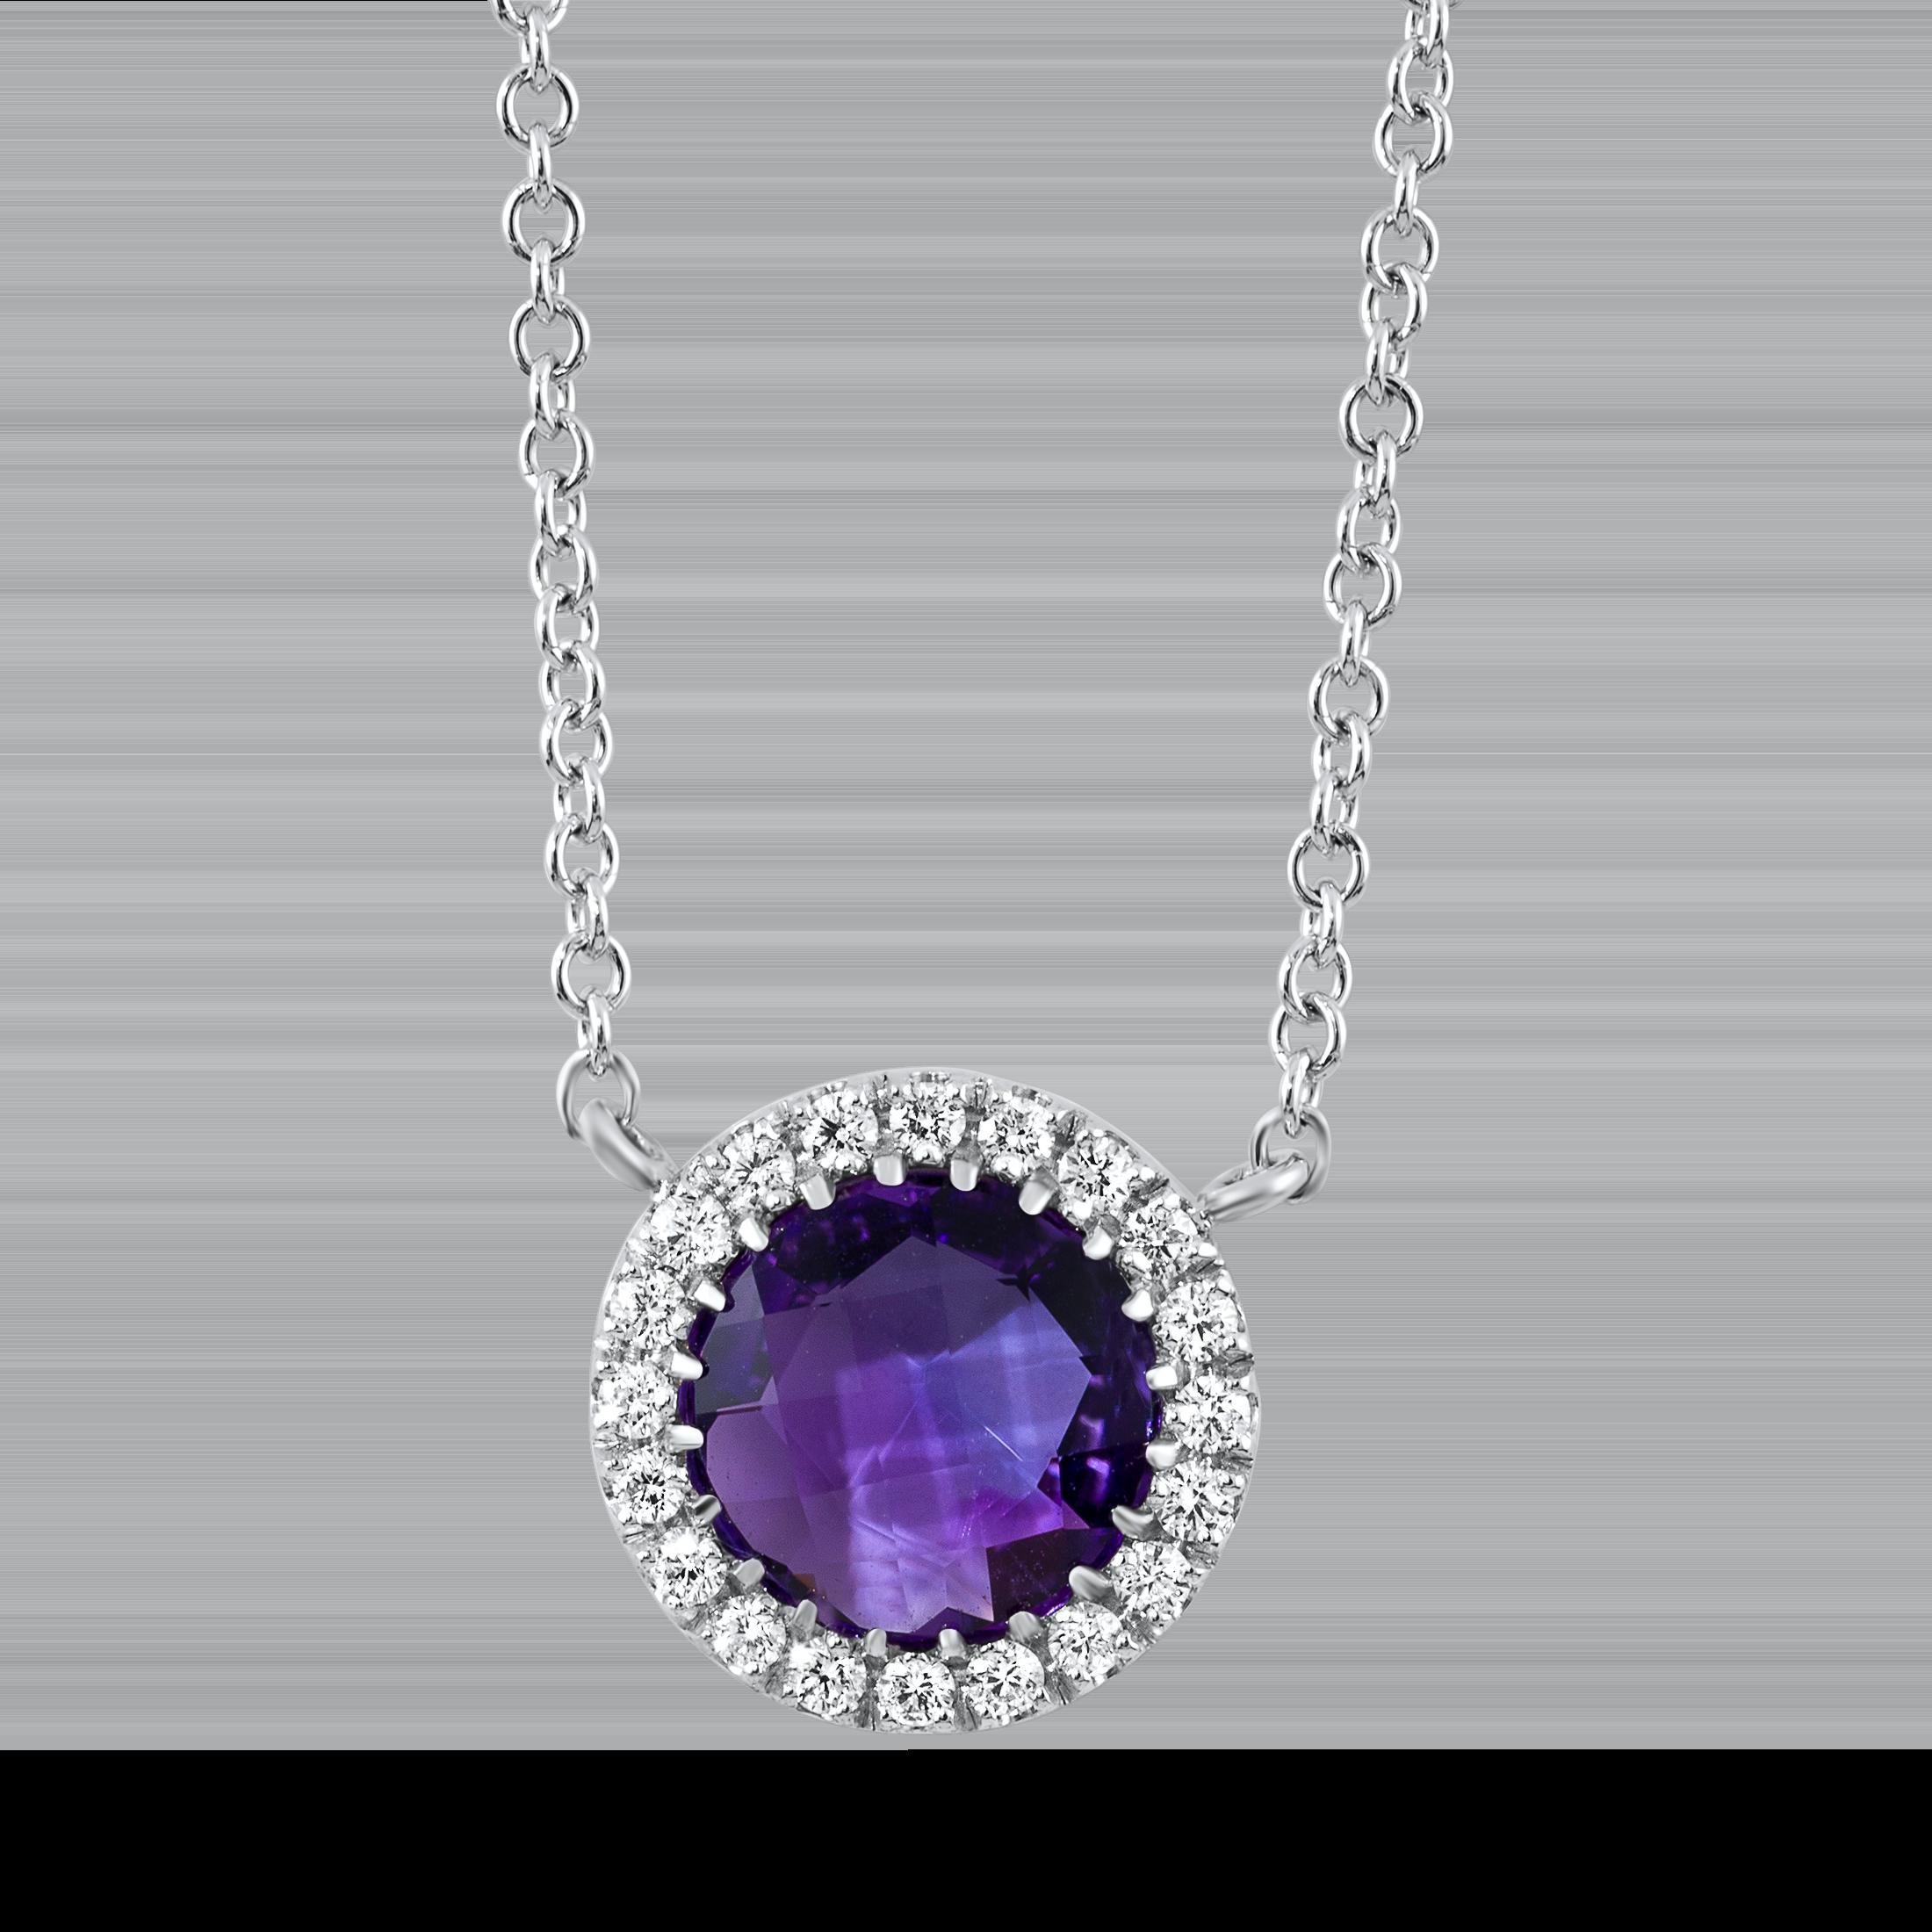 carat diamond diamondland. Necklace clipart amethyst